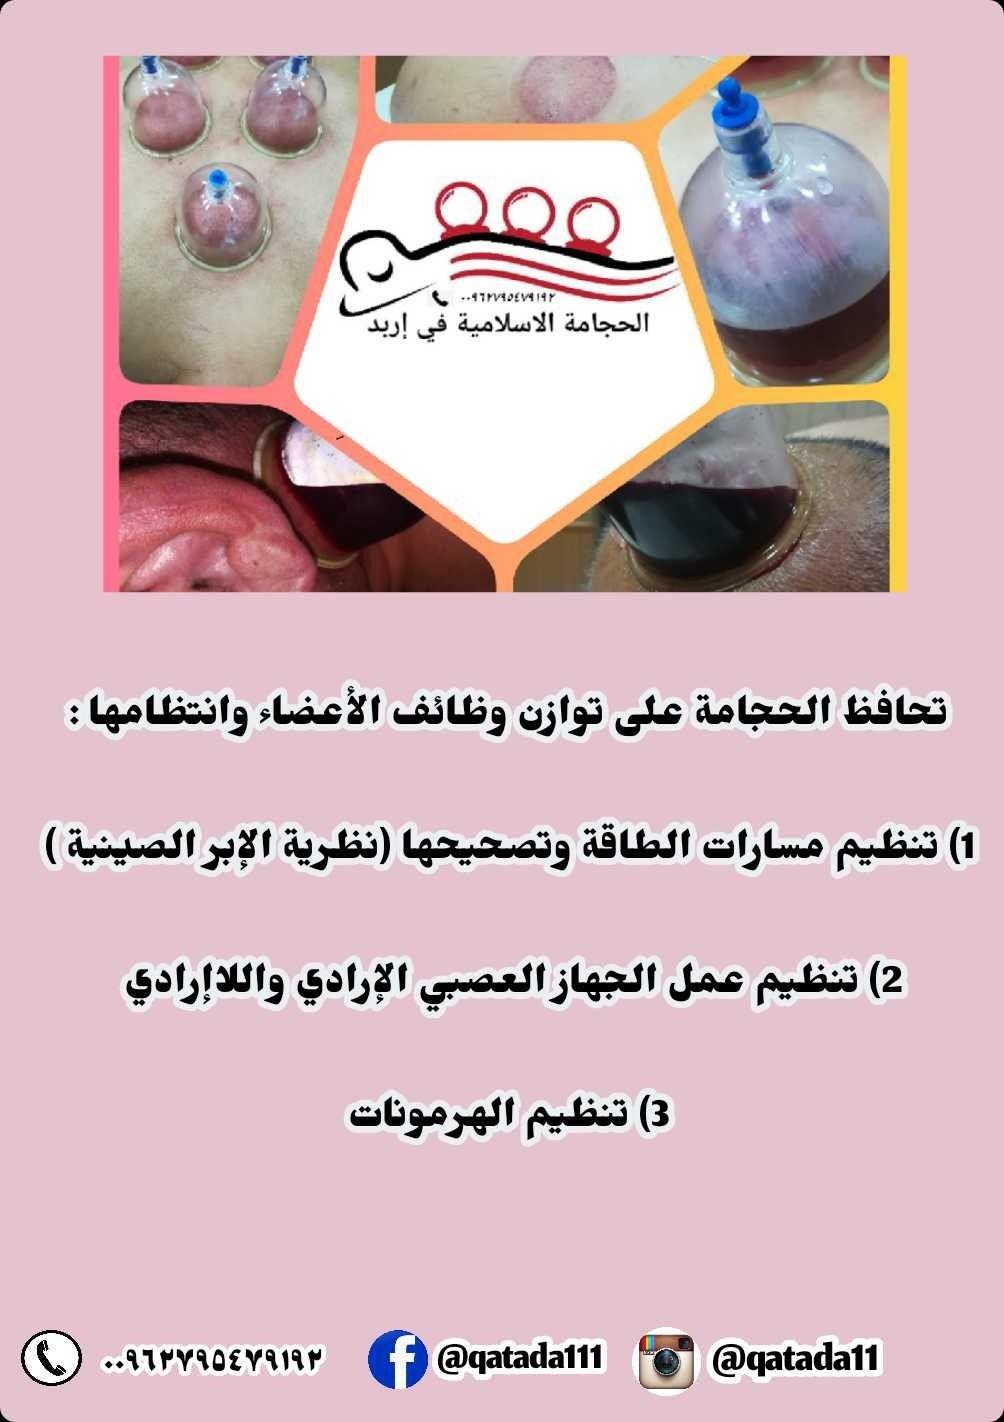 Pin By الحجامة الإسلامية On ميكانيكية الحجامة في علاج الامراض Hand Soap Bottle Soap Bottle Hand Soap